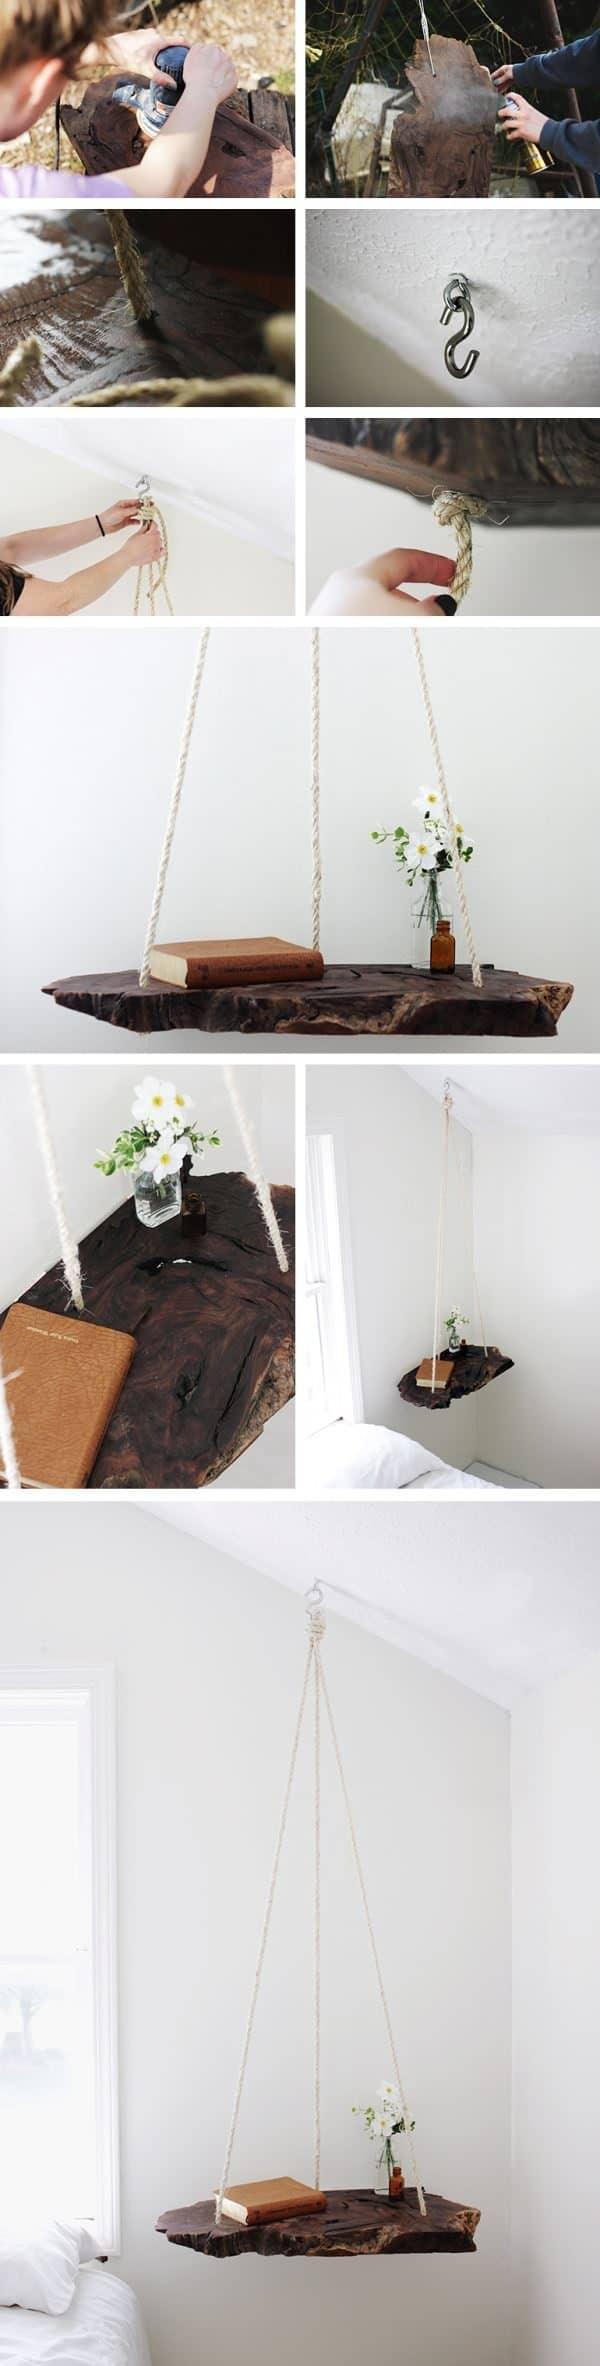 Wood-log-pendant-table-01